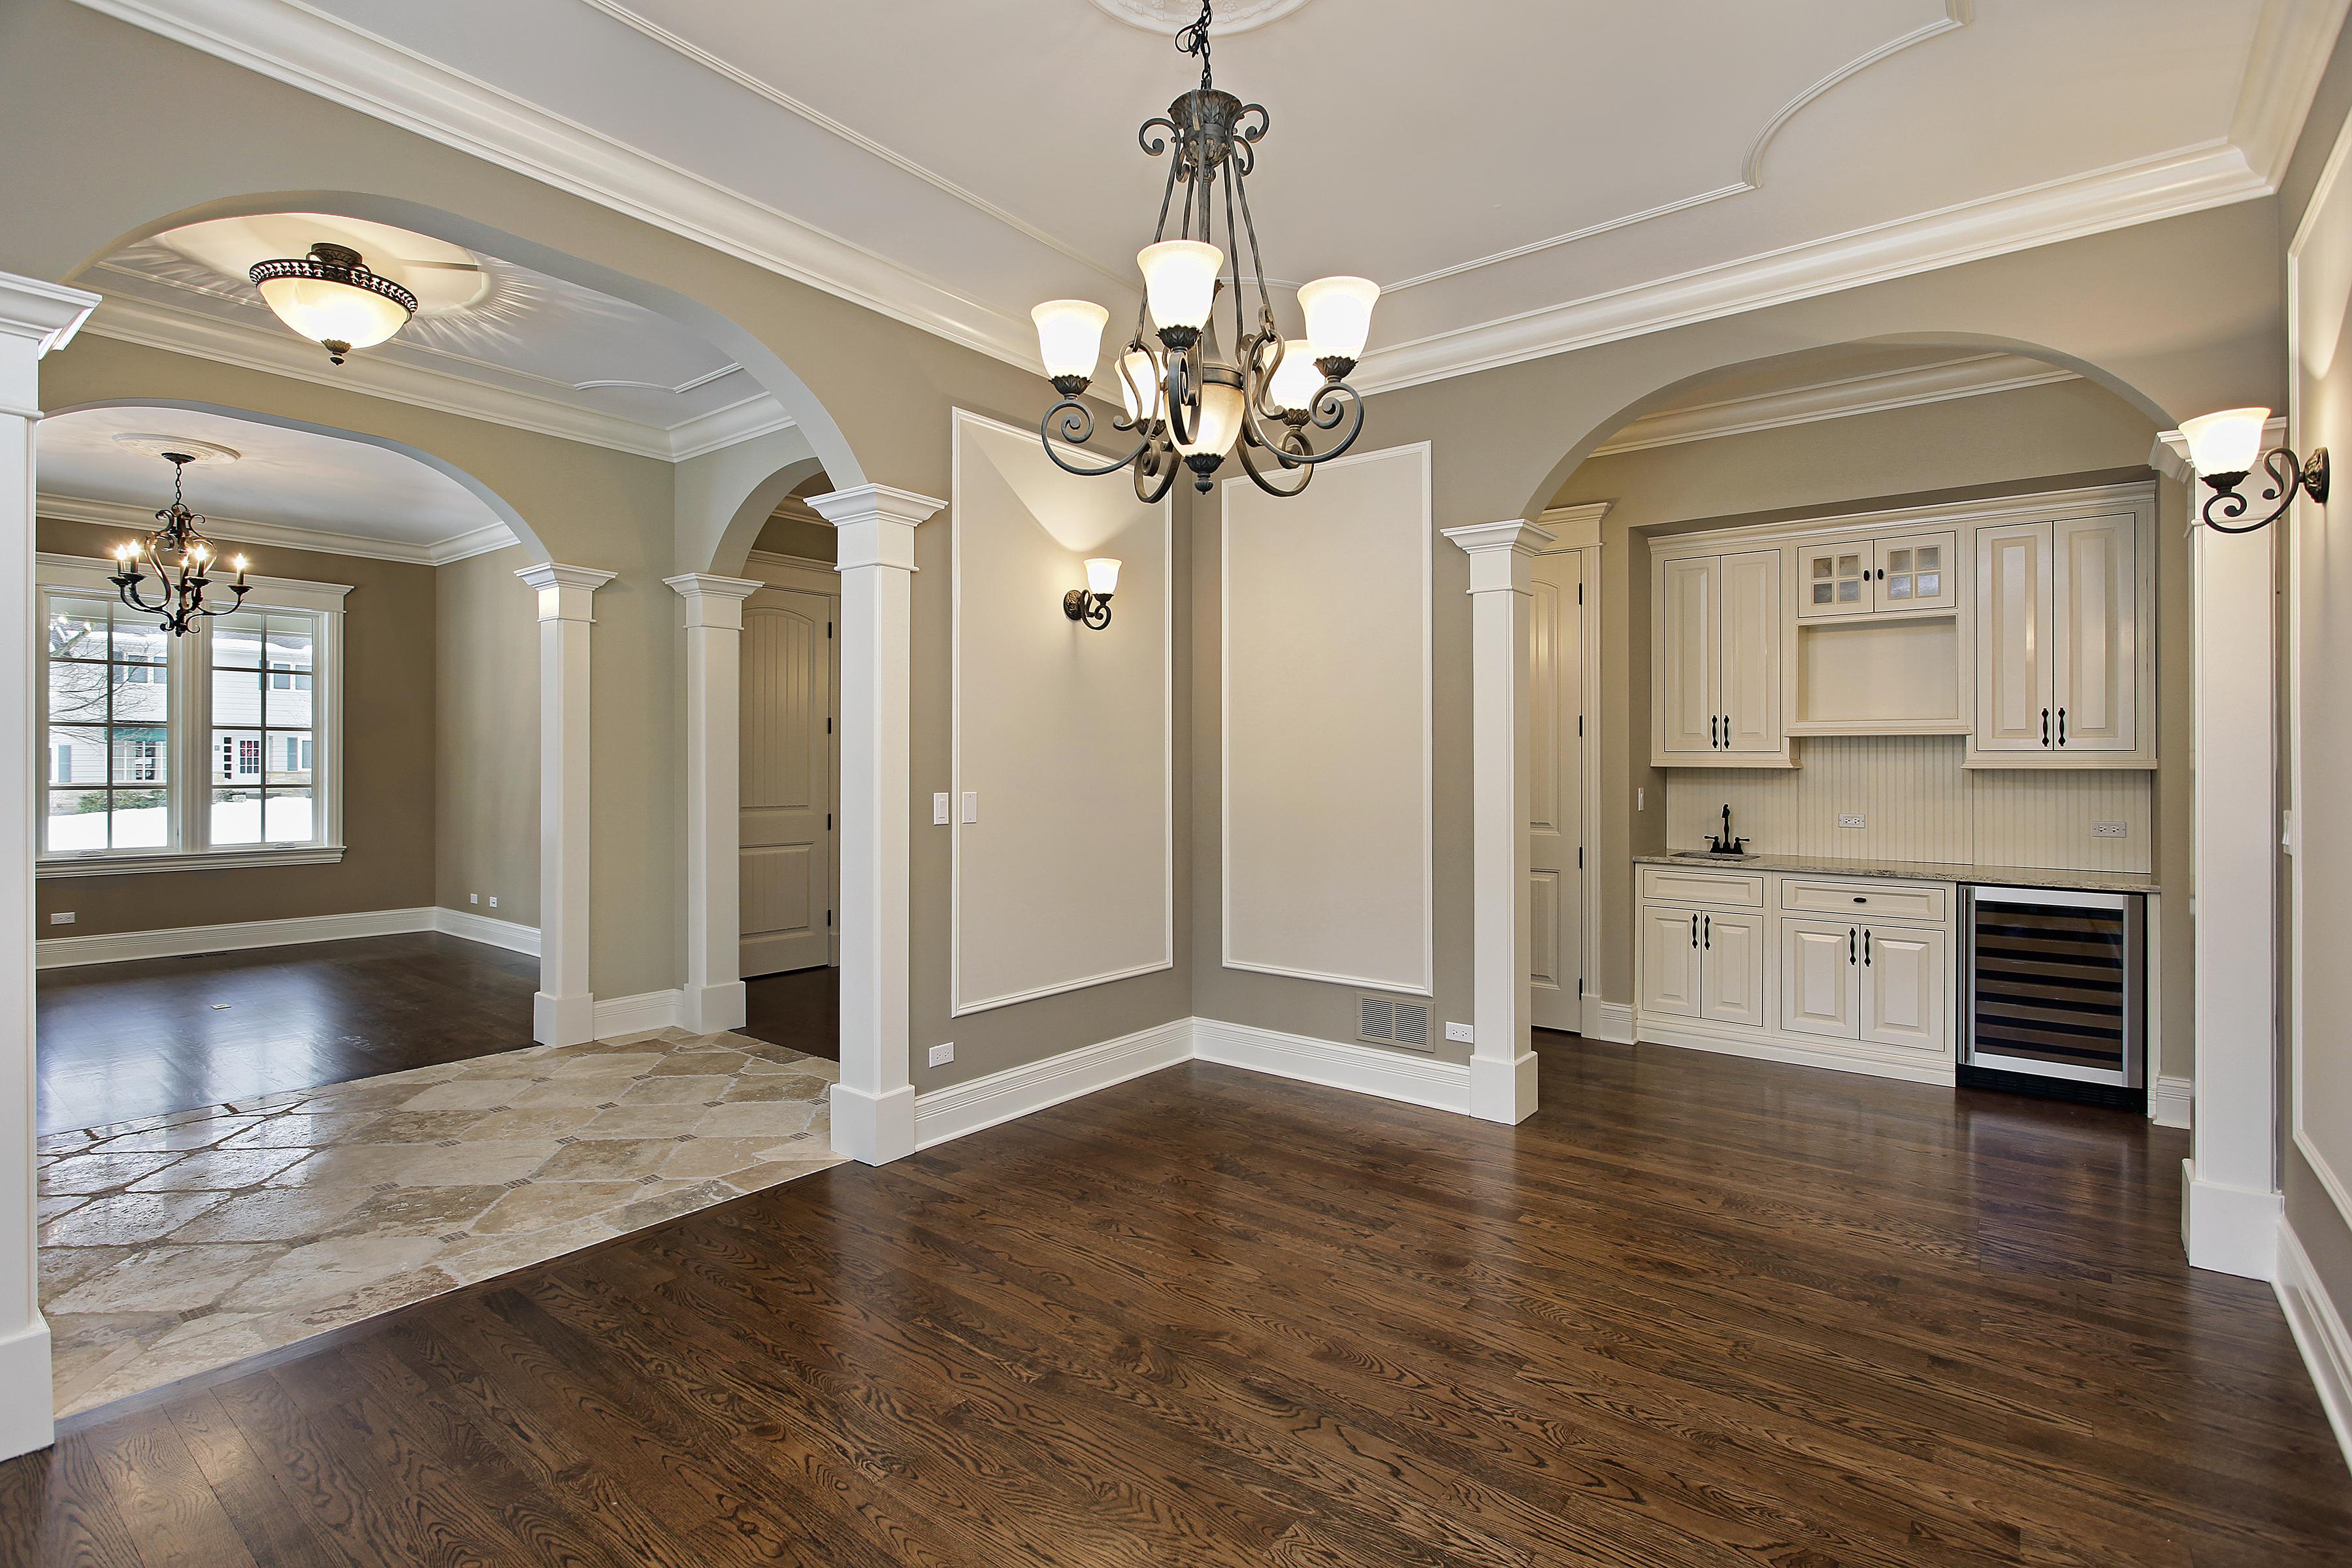 bigstock-Dining-room-in-new-constructio-16568549